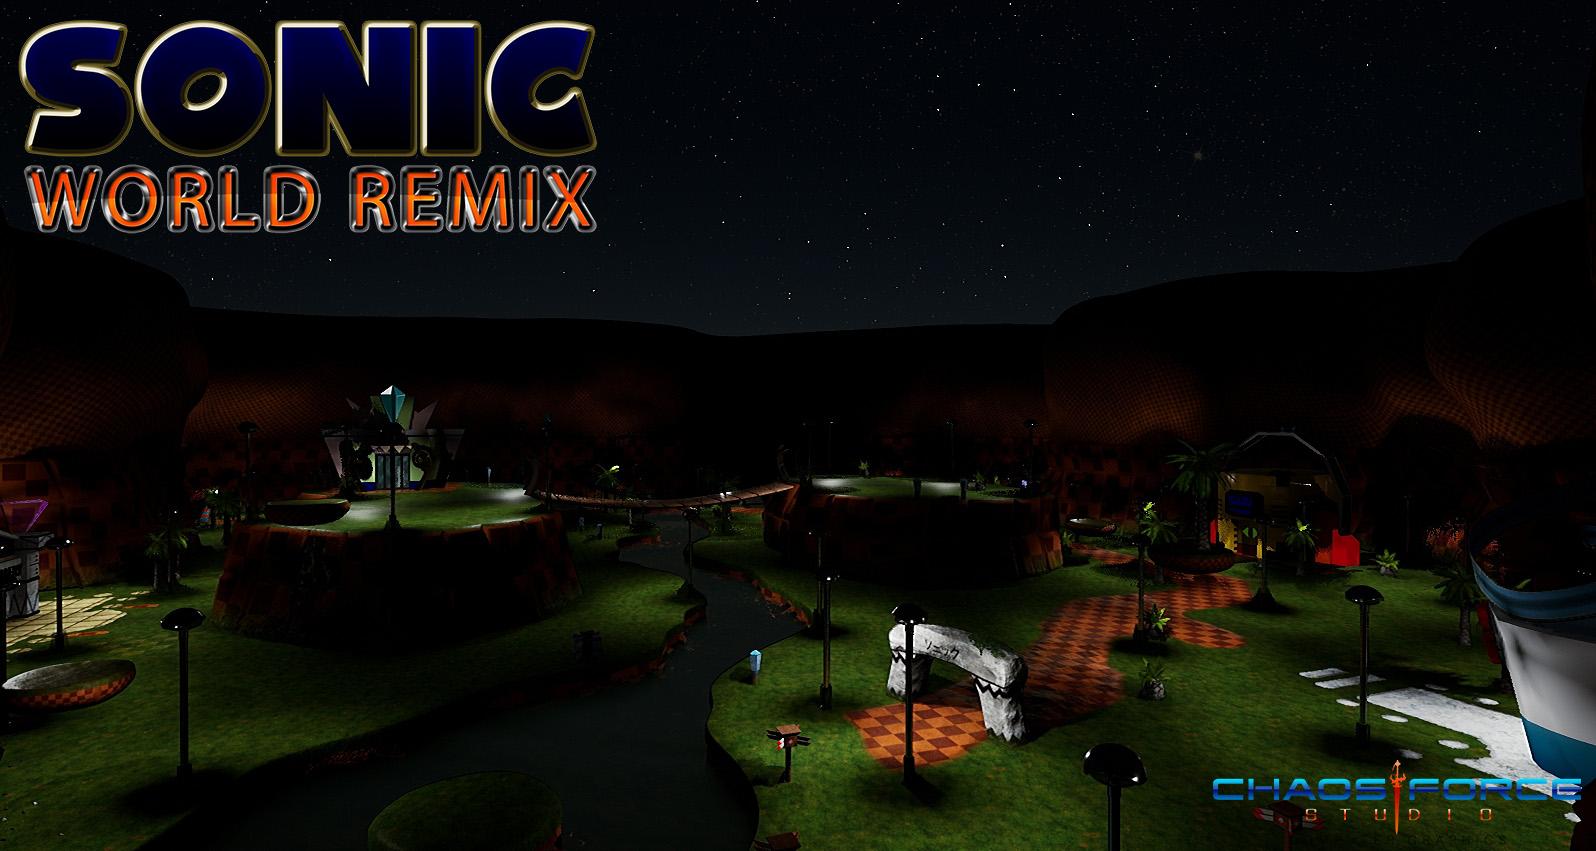 Sonic World Remix Nighttime.jpg